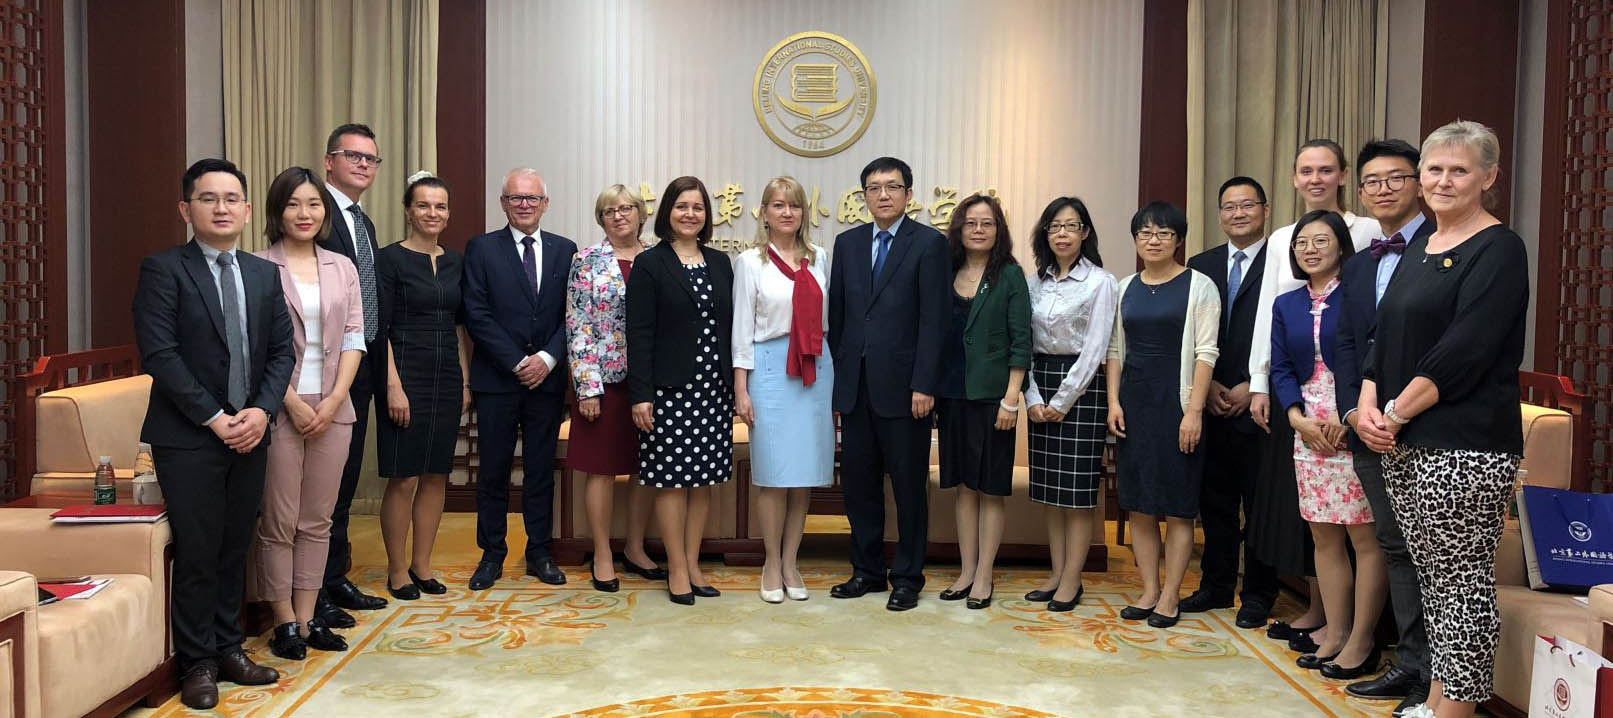 3c45dae89f Možnosti spolupráce vo vzdelávaní v oblasti obchodu a cestovného ruchu na  Beijing University of International Studies